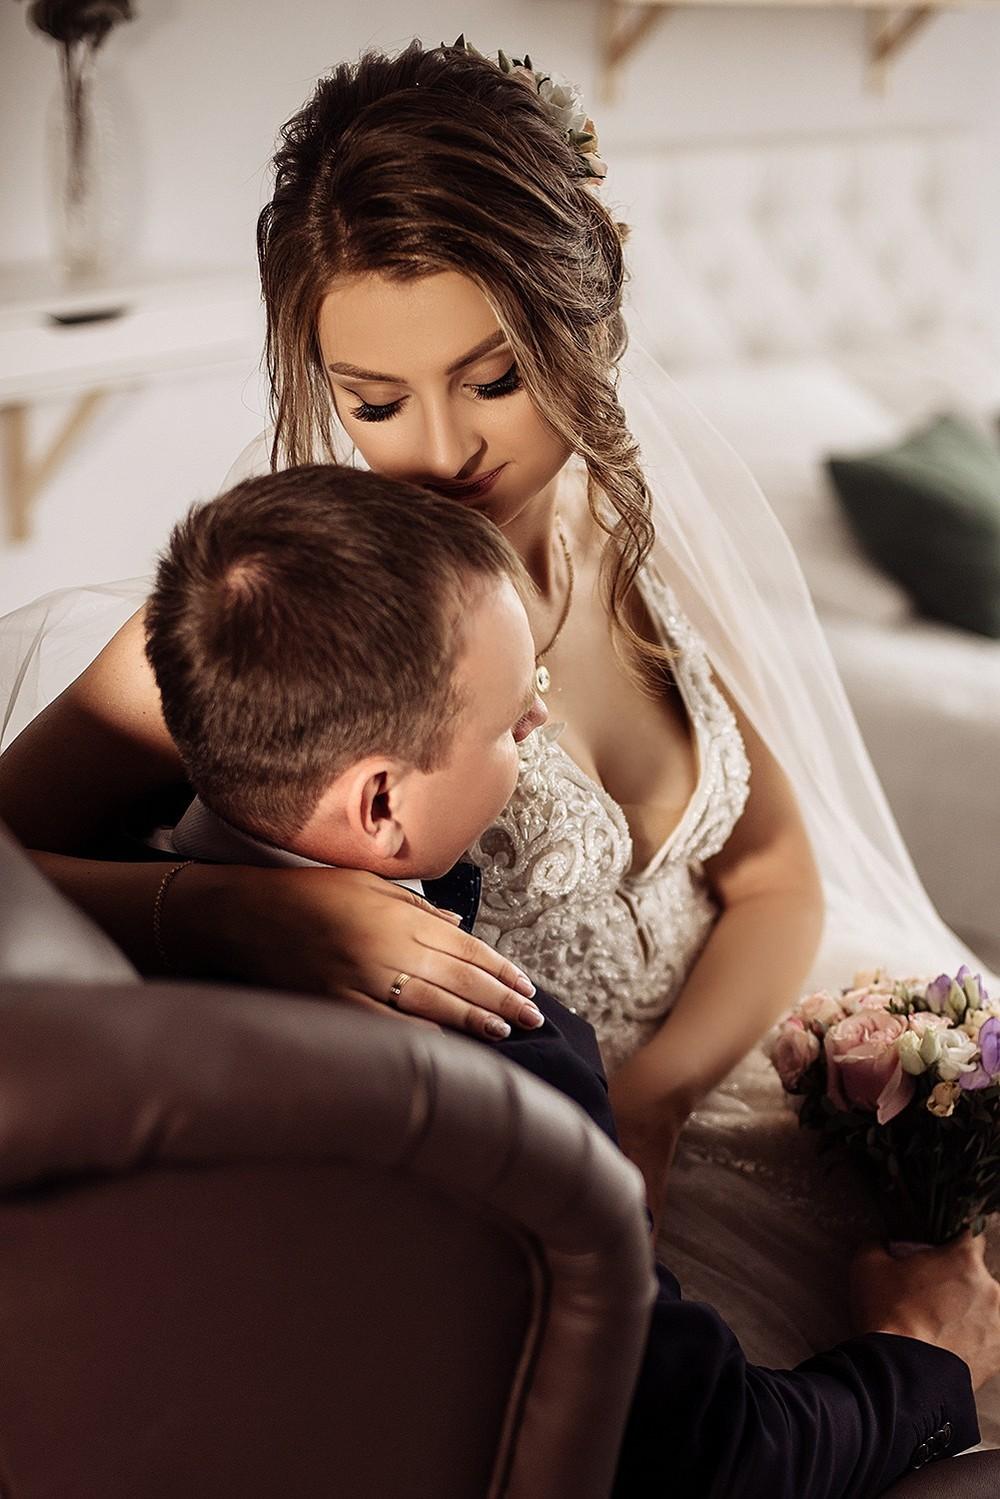 Свадебная фотосъемка и лав стори - 14 июня 2019